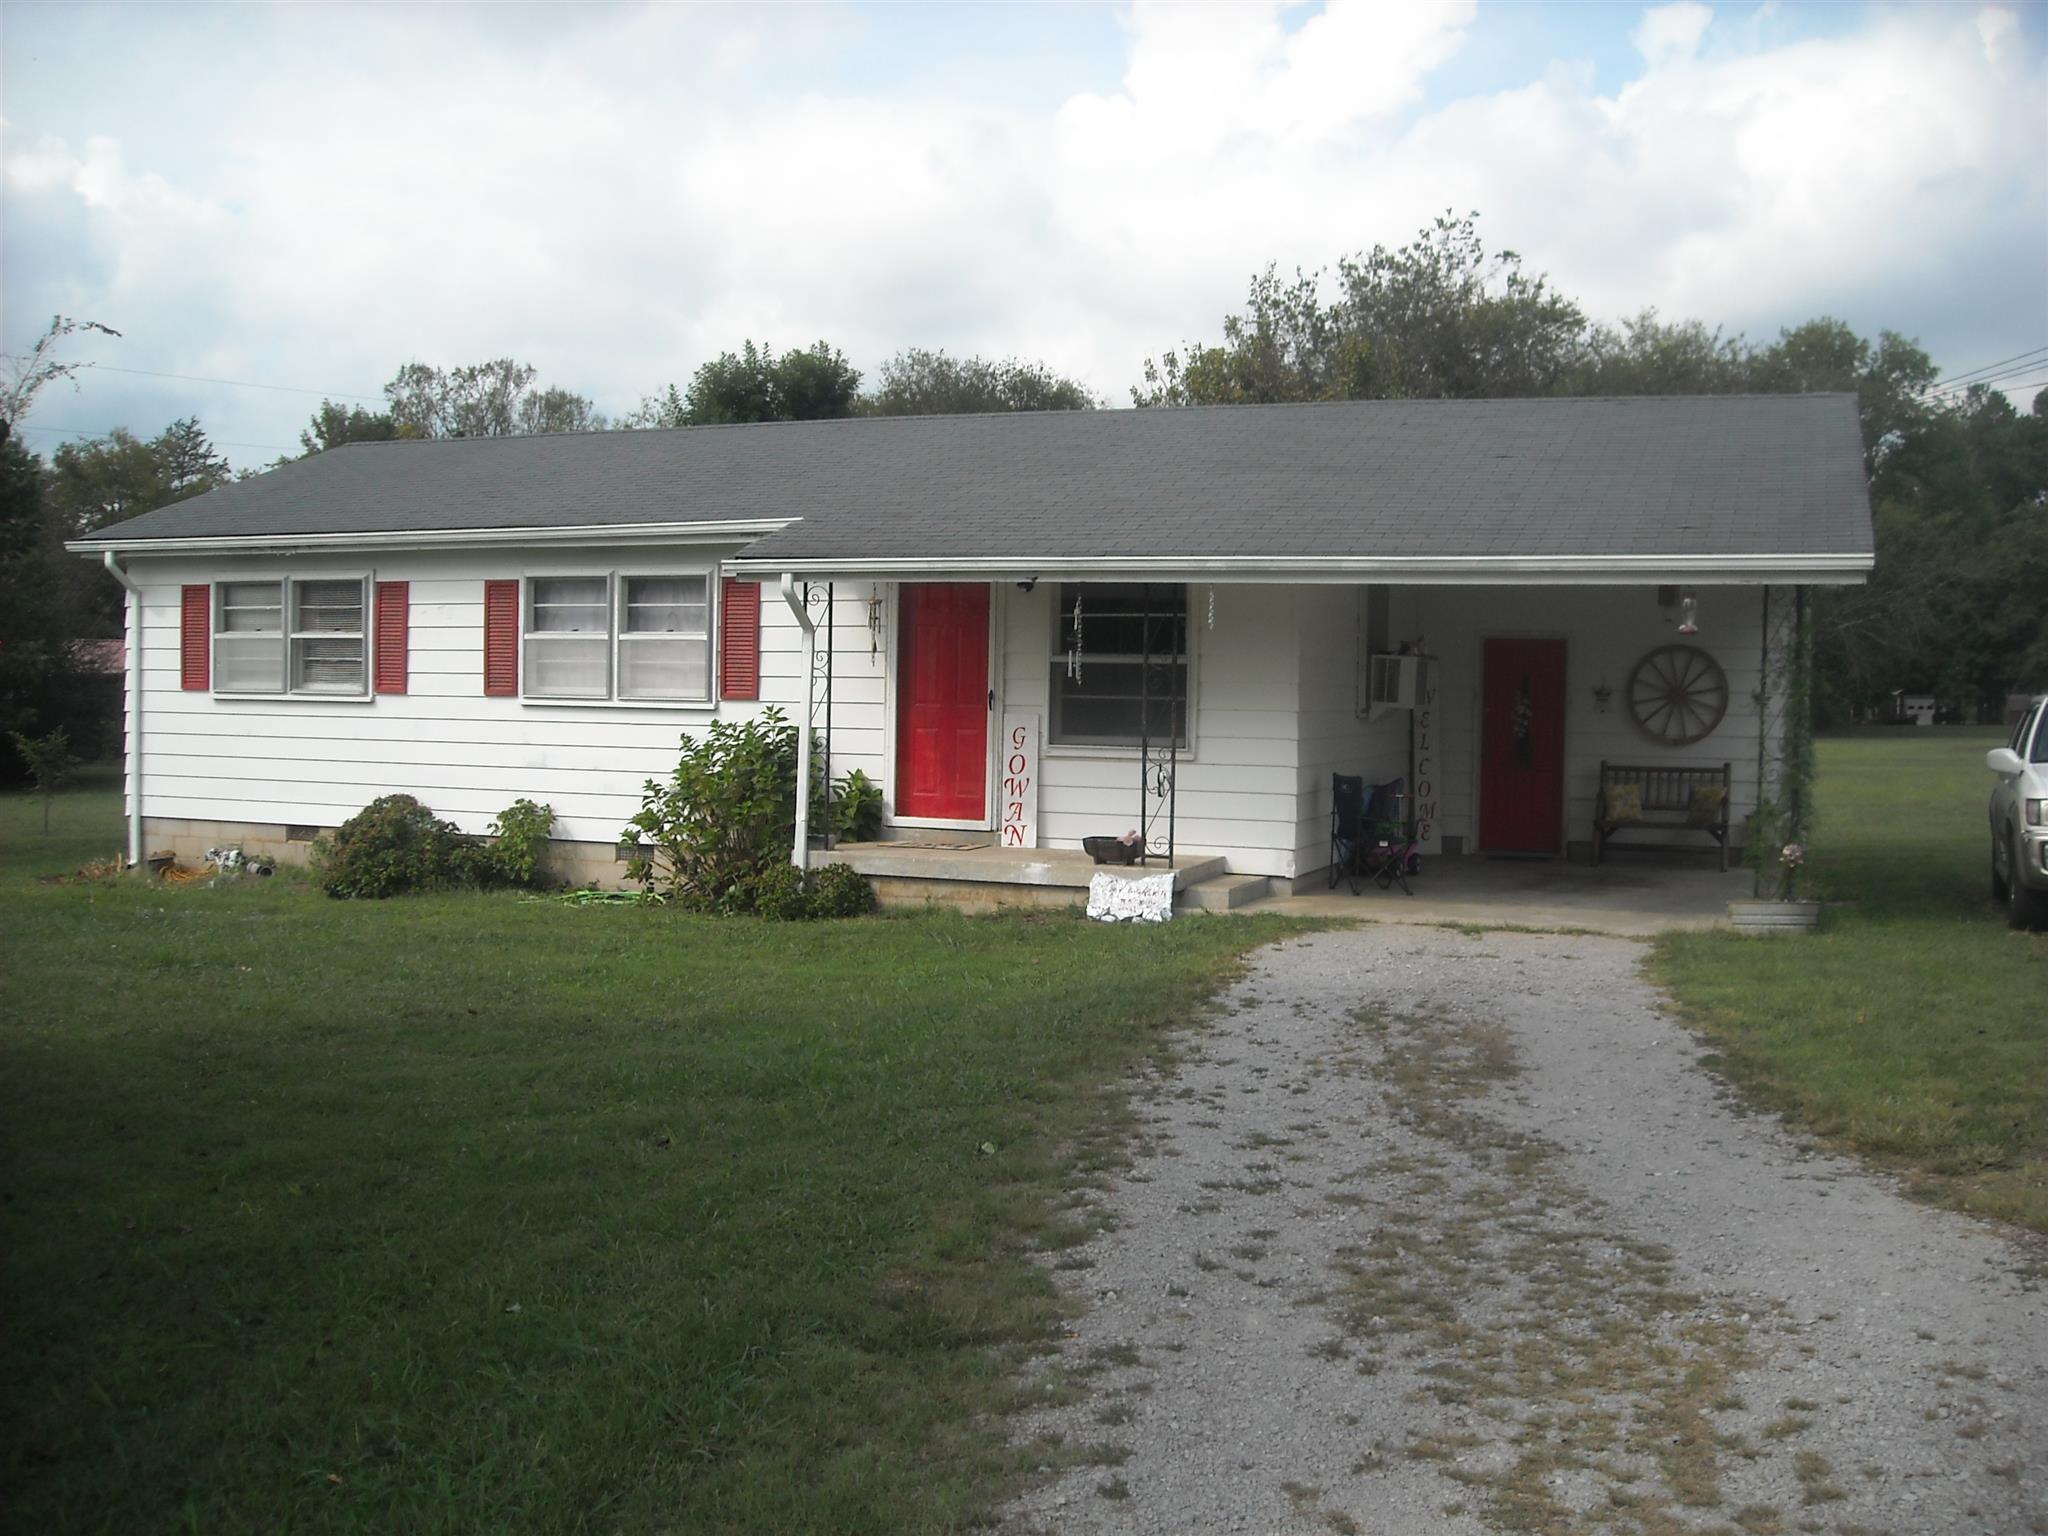 205 Fry Lane, Pulaski, TN 38478 - Pulaski, TN real estate listing